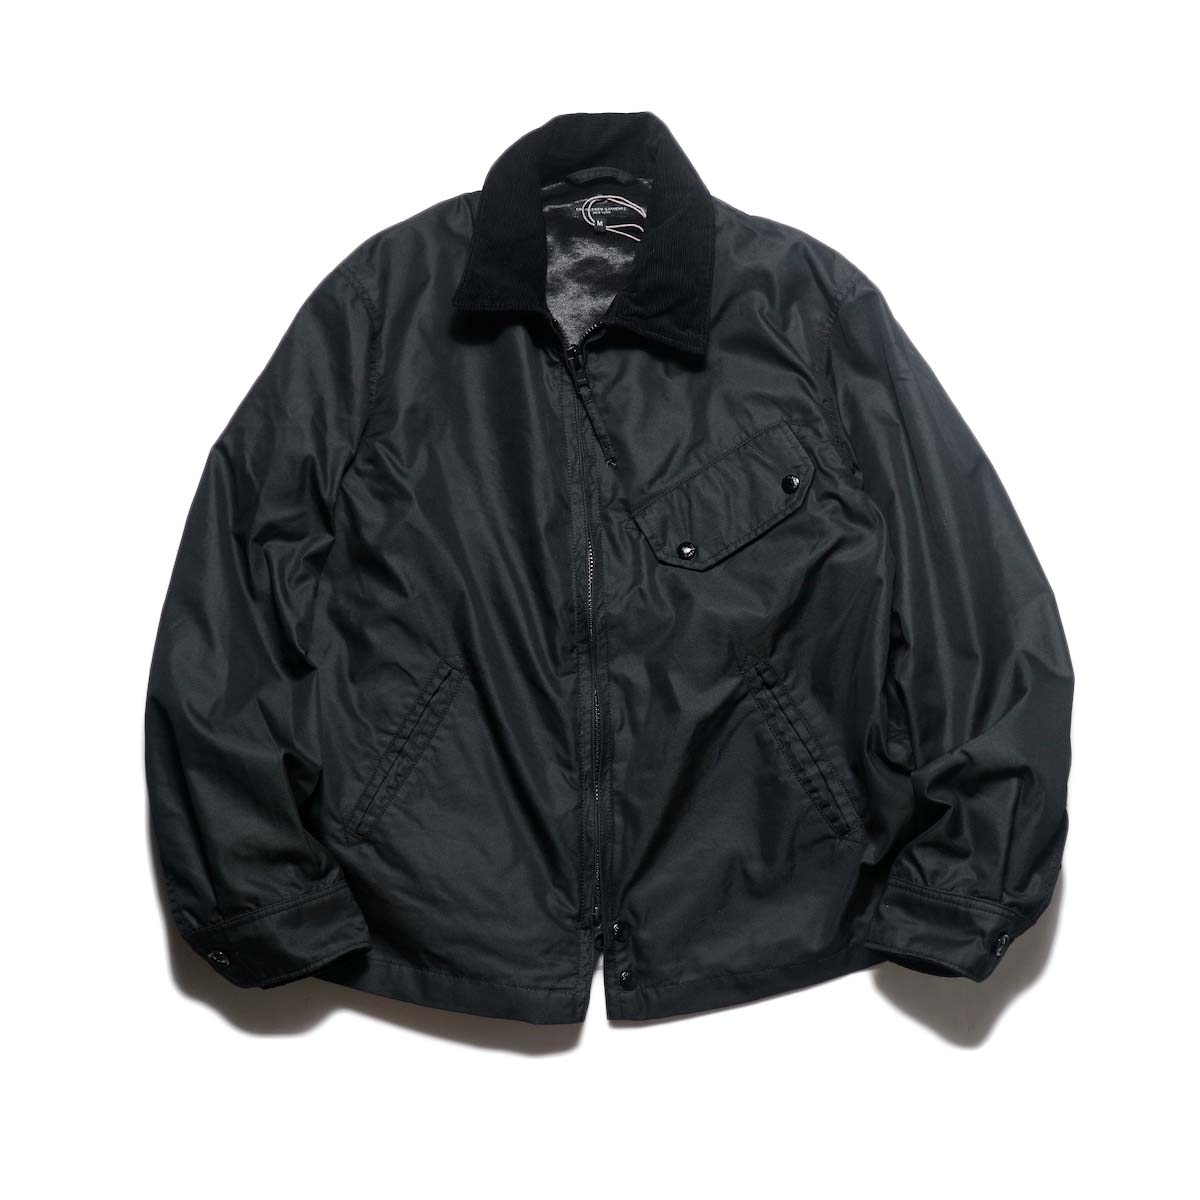 Engineered Garments / Driver Jacket - Pc Iridescent Twill (Black)